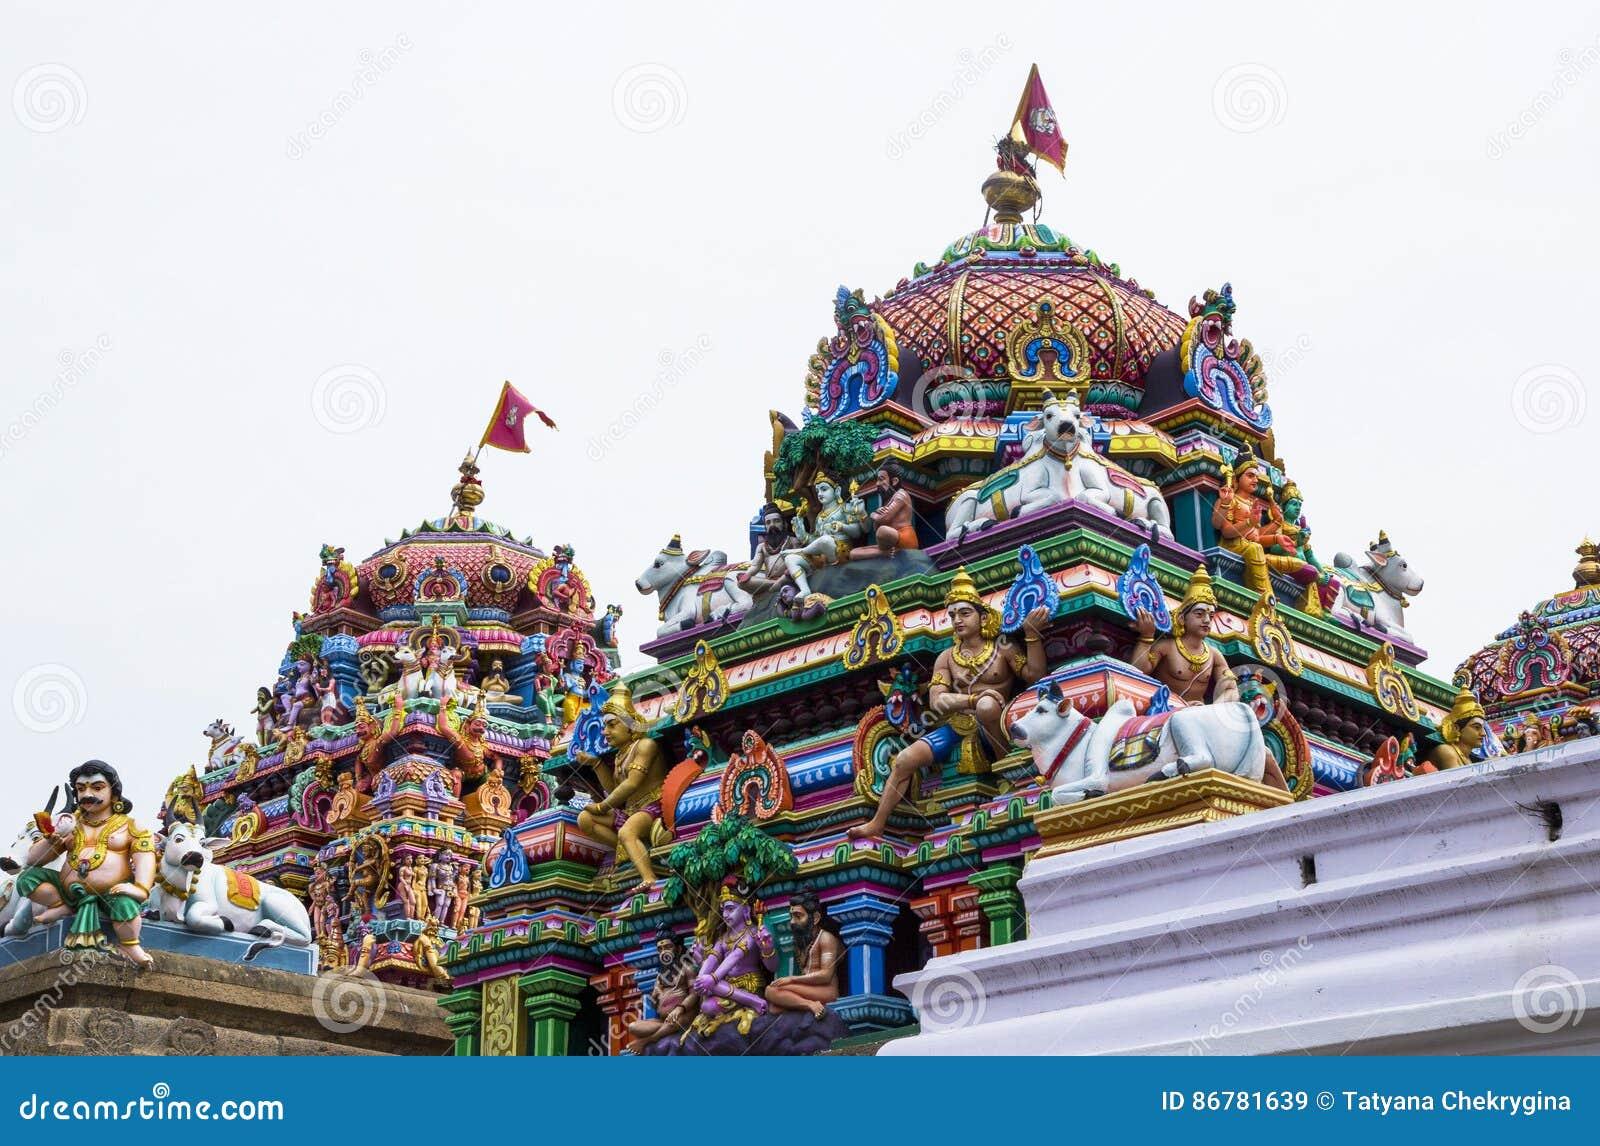 Temple antique de Shiva, Kapaleeswarar, Chennai, Inde